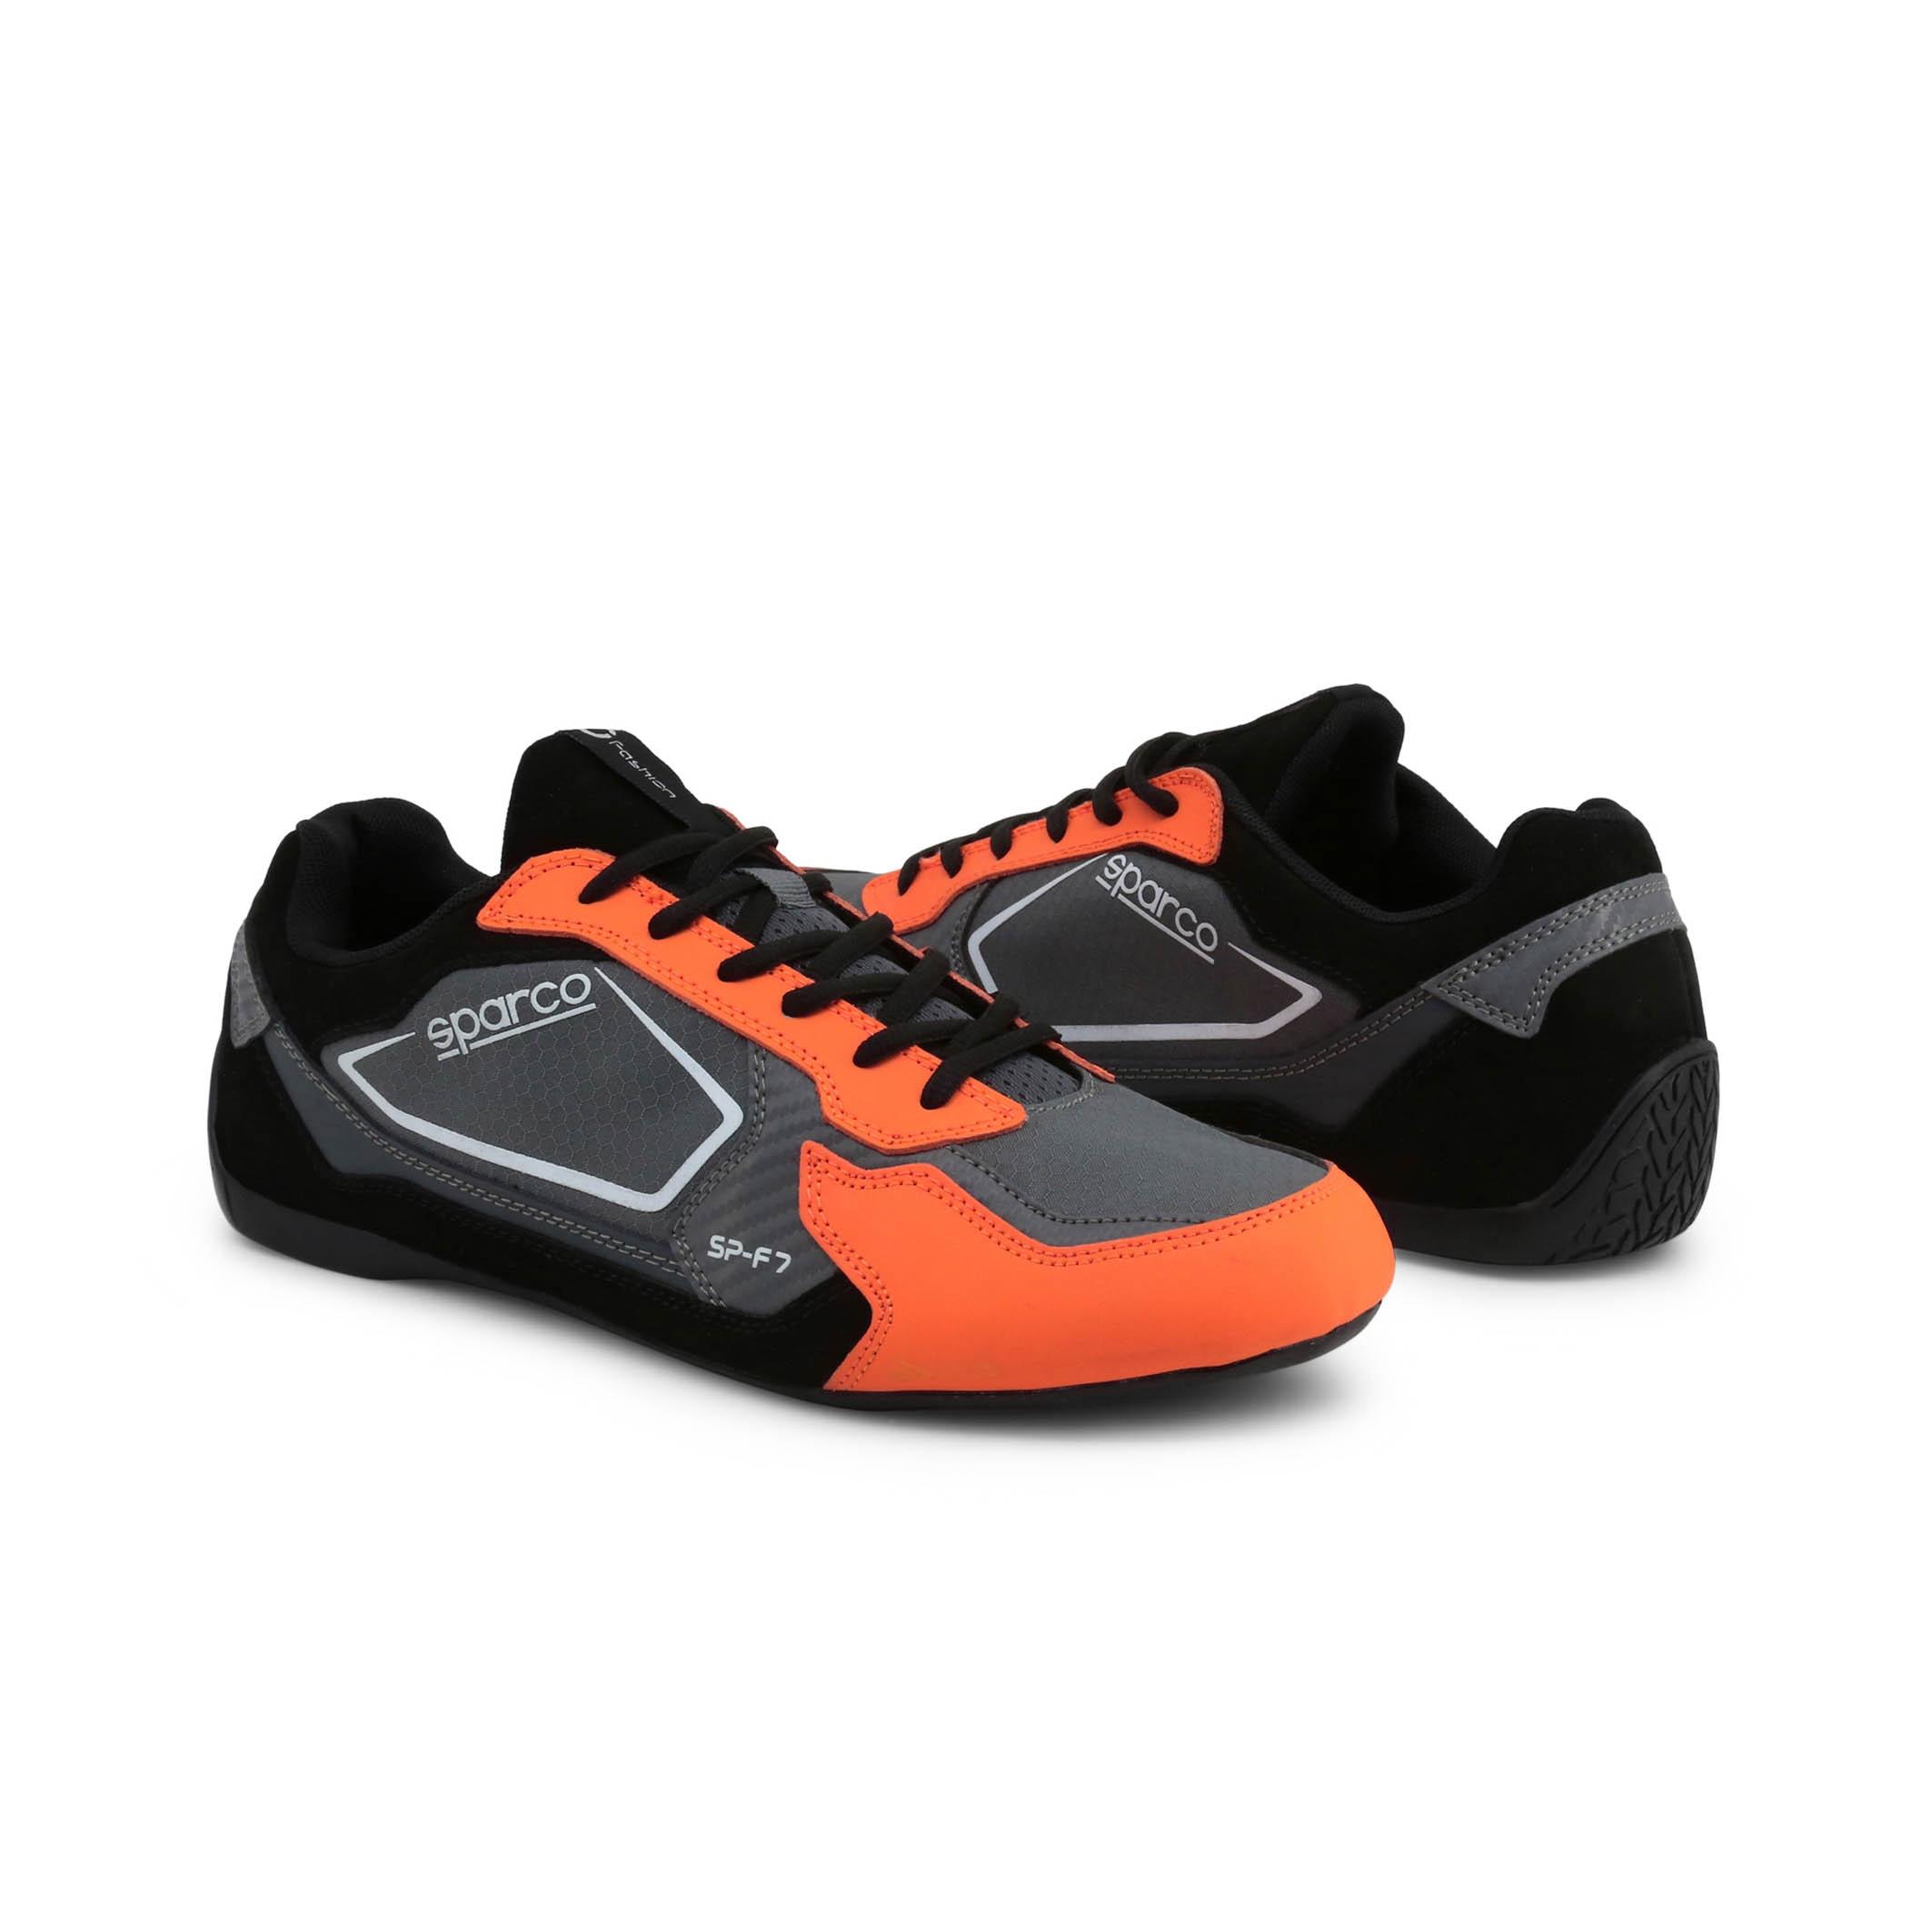 Pantofi sport Sparco SP-F7 Gri